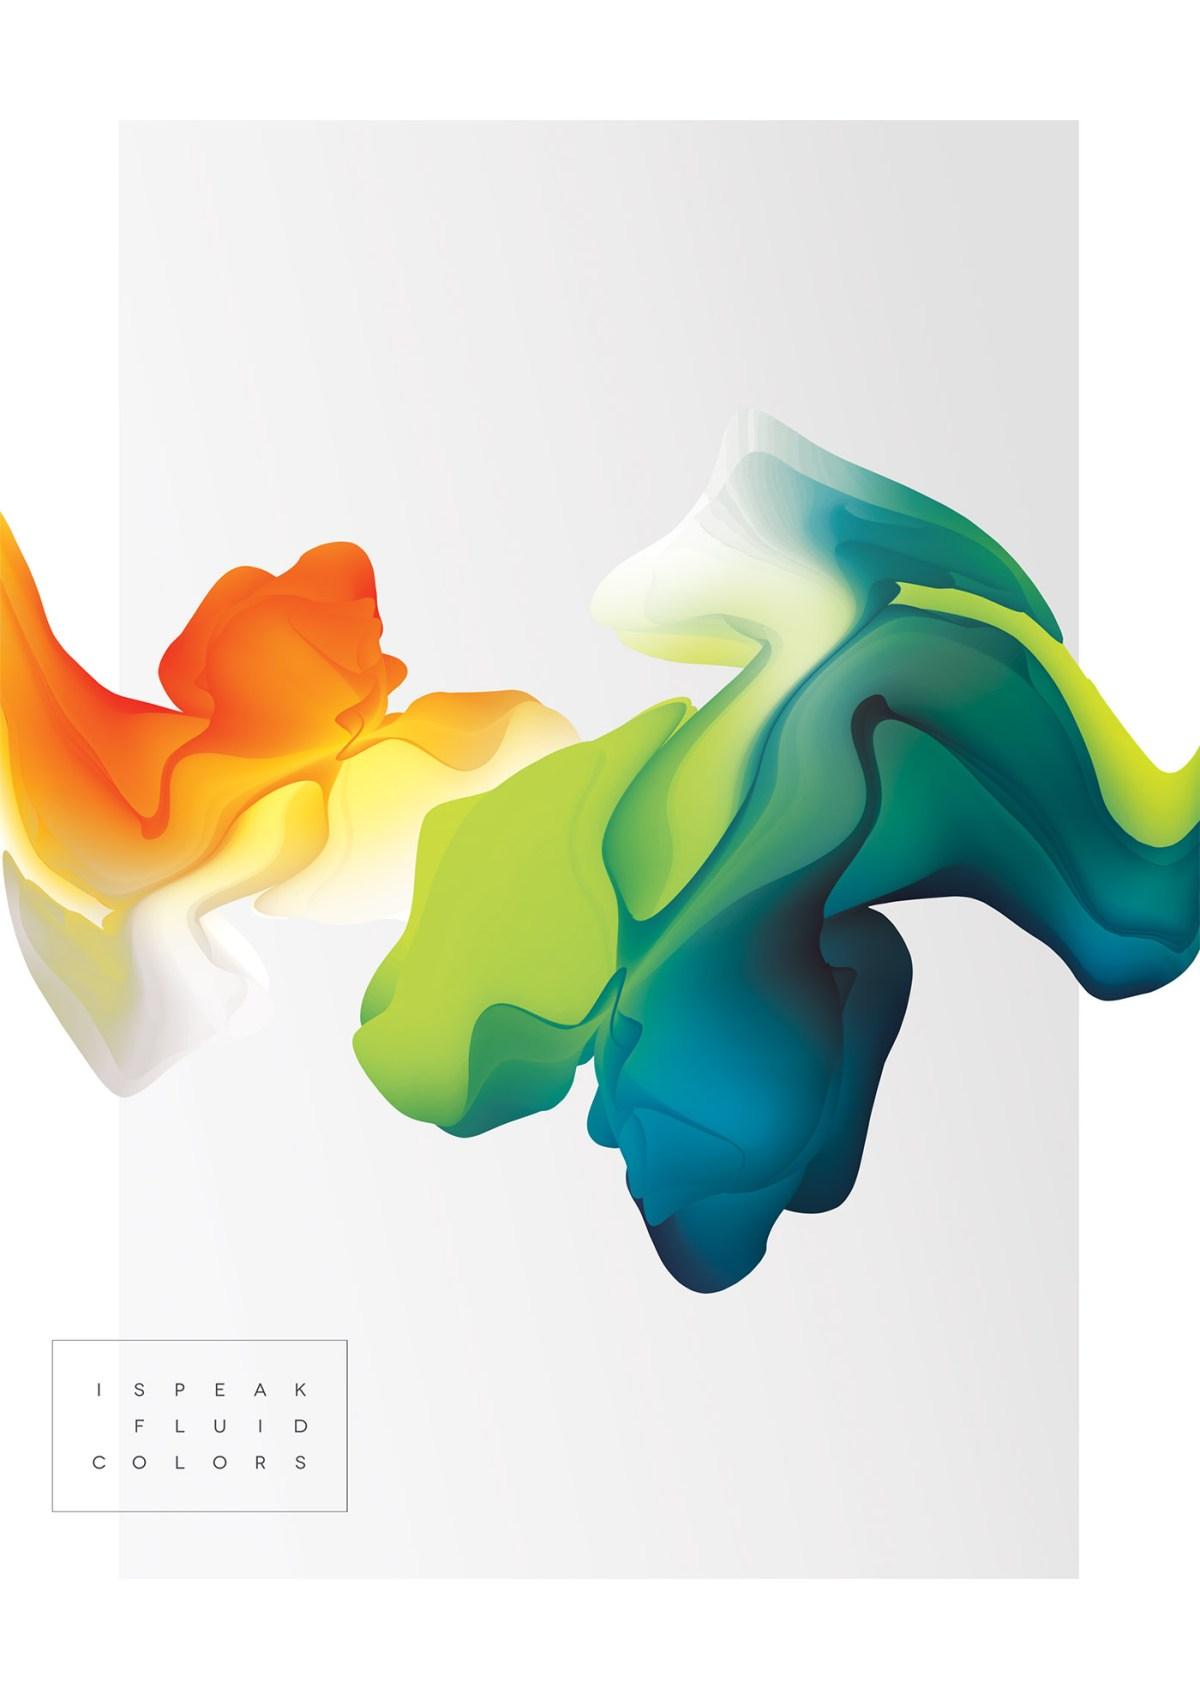 fluid-colors-moss-and-fog-3